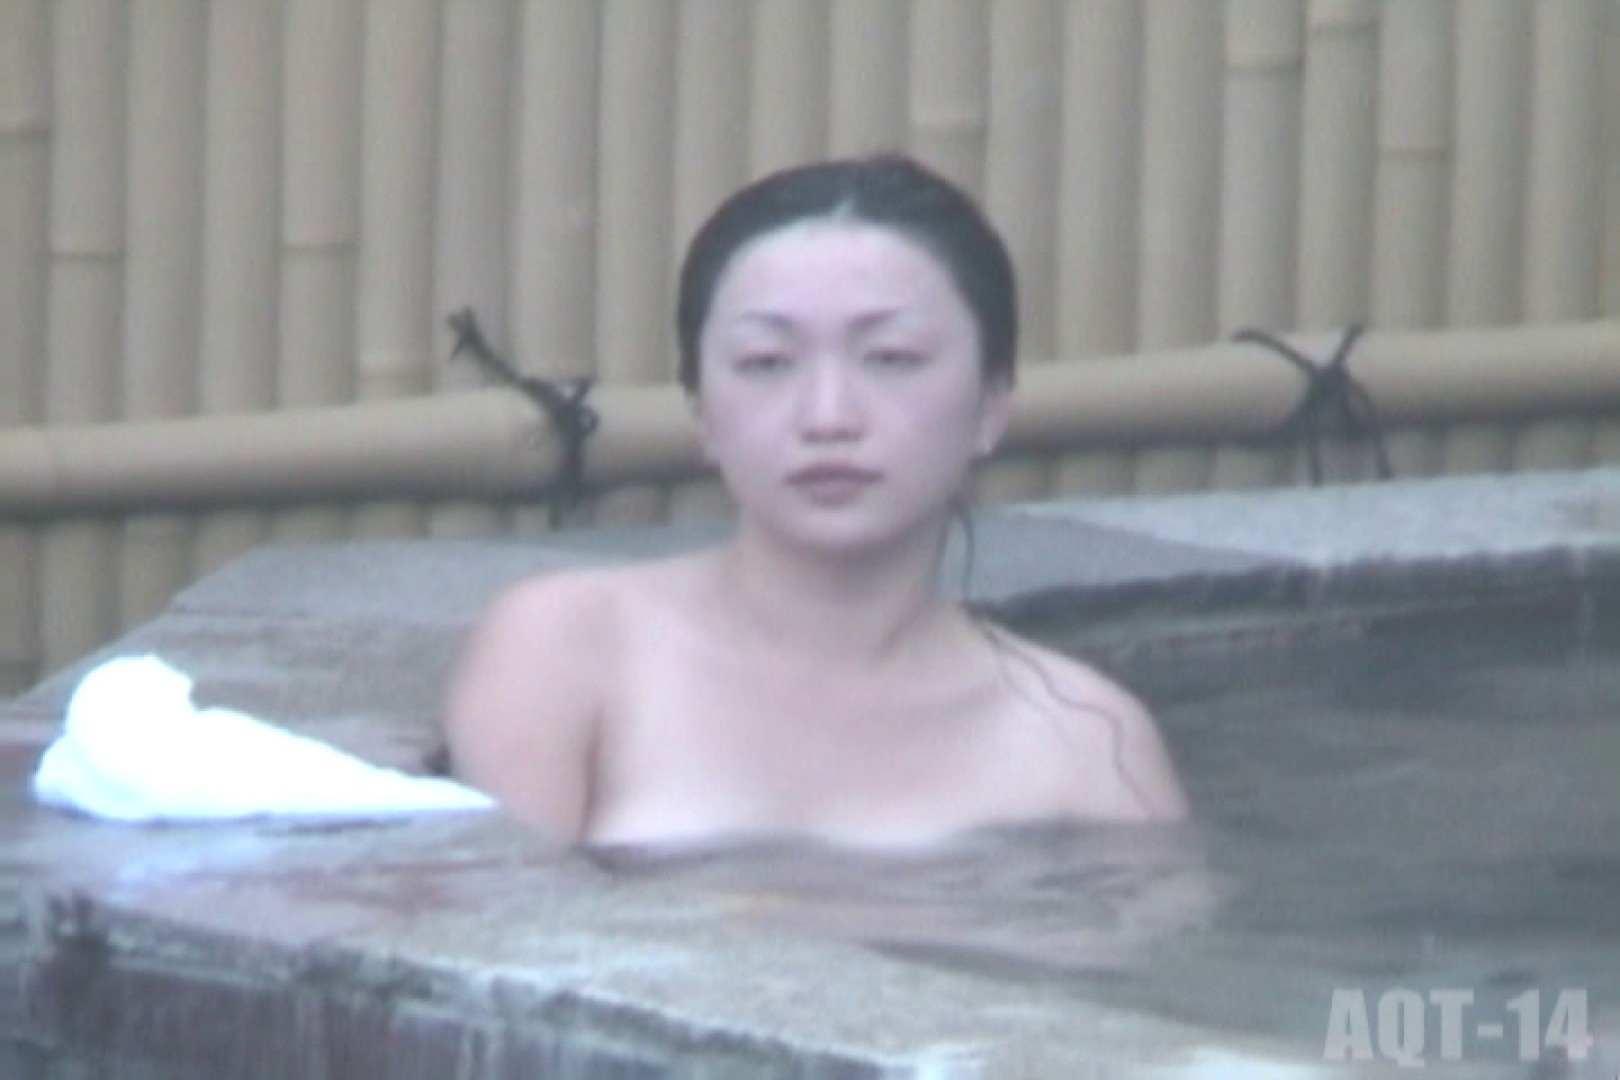 Aquaな露天風呂Vol.826 盗撮 | OLエロ画像  88PICs 1